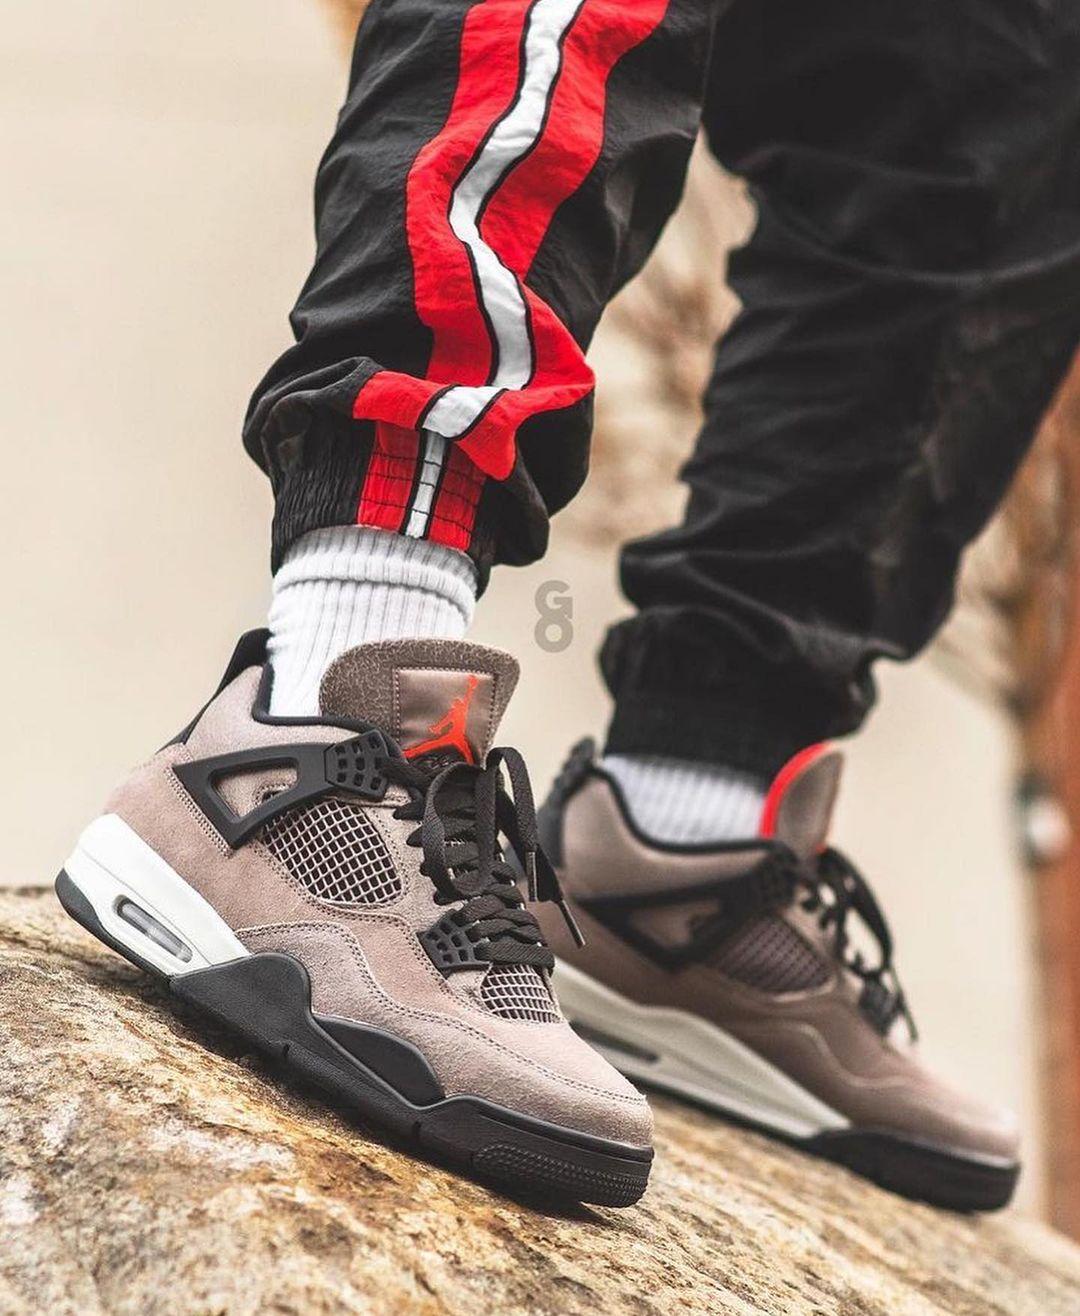 Air Jordan 4 Retro 'Taupe Haze' - Sneaker Myth